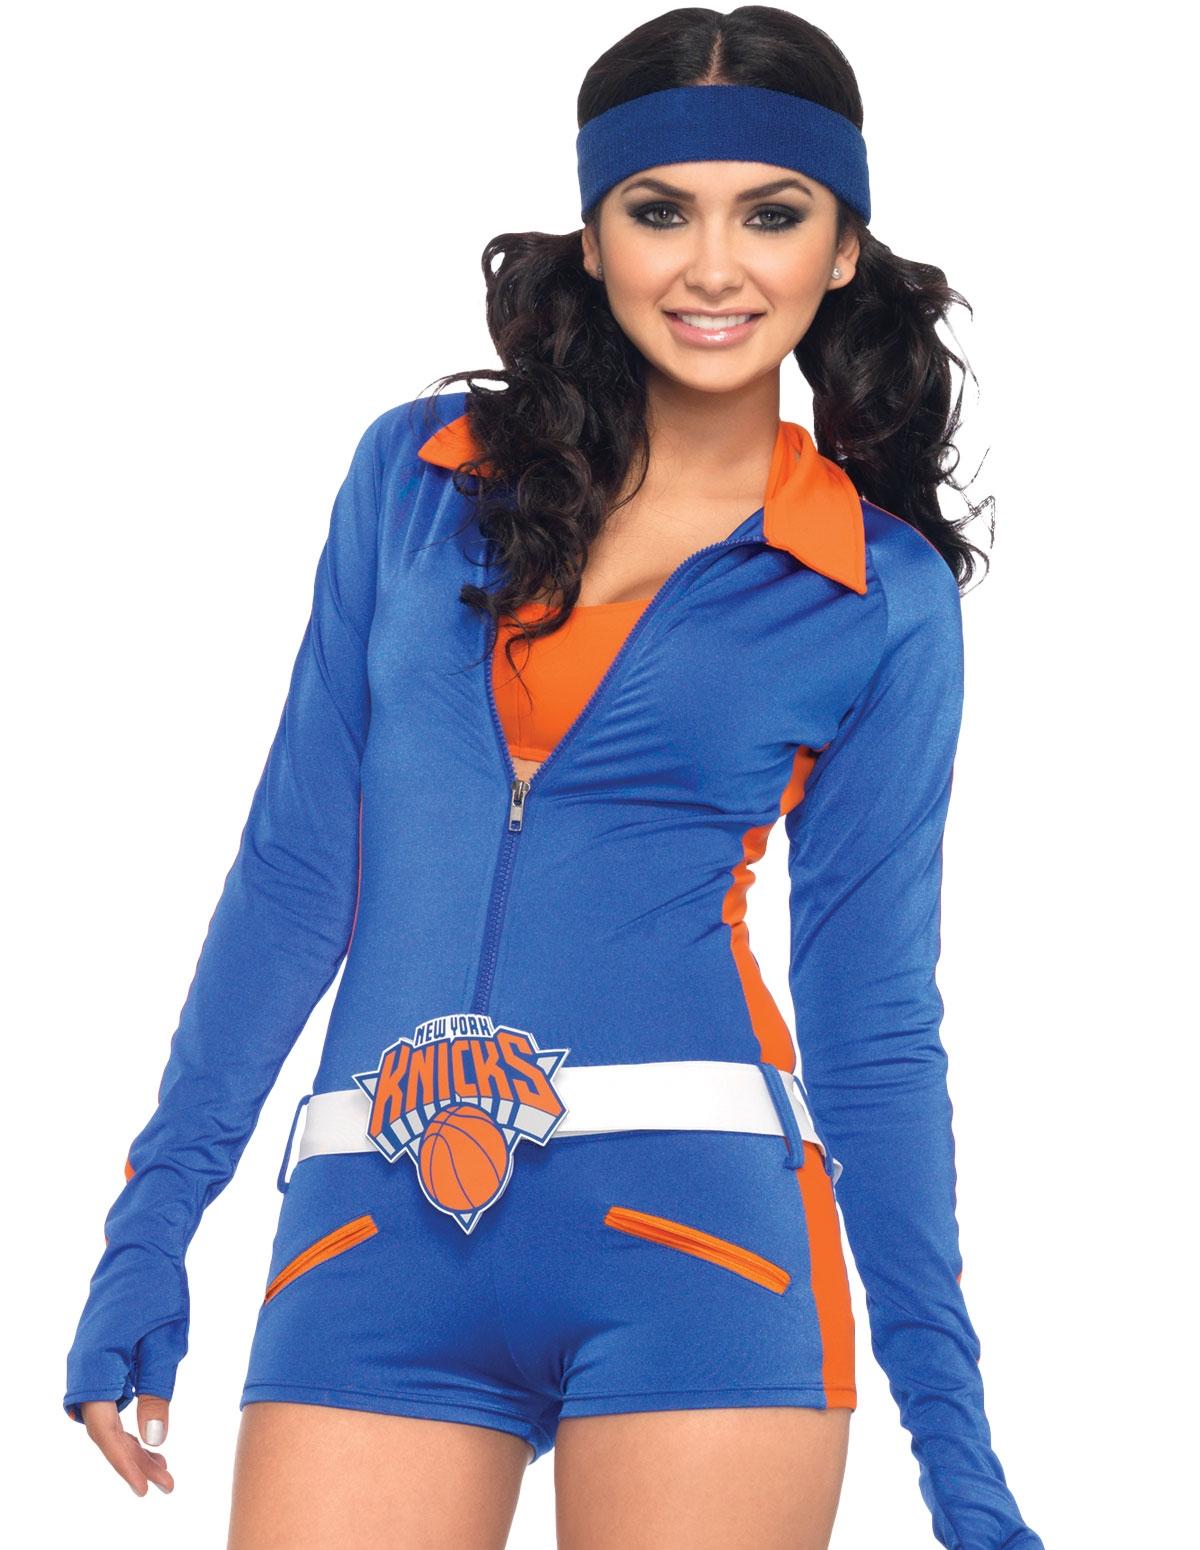 Ny Knicks Dancer Romper Costume